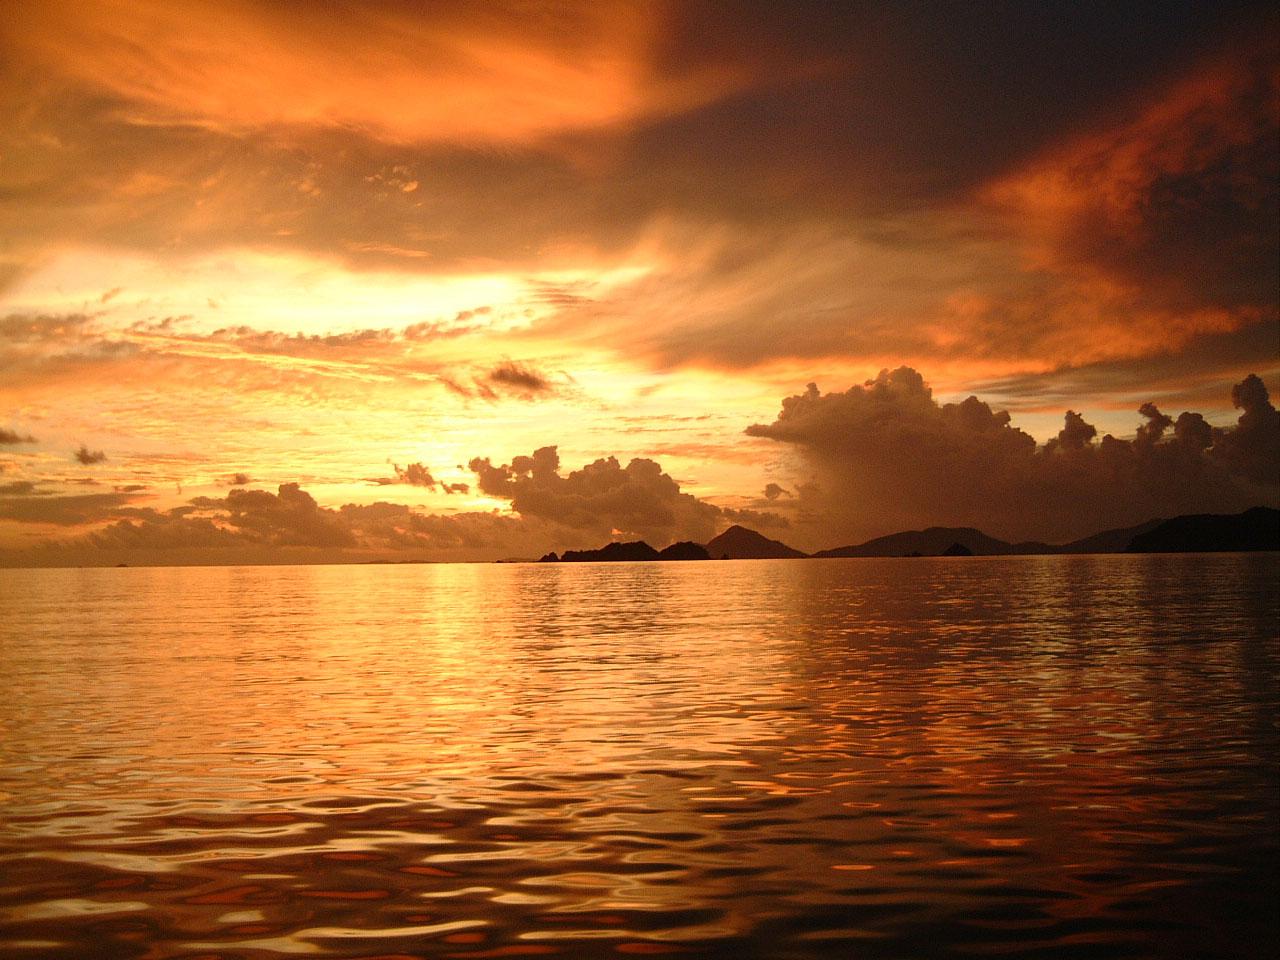 Sunset Philippines Club Paradise 02